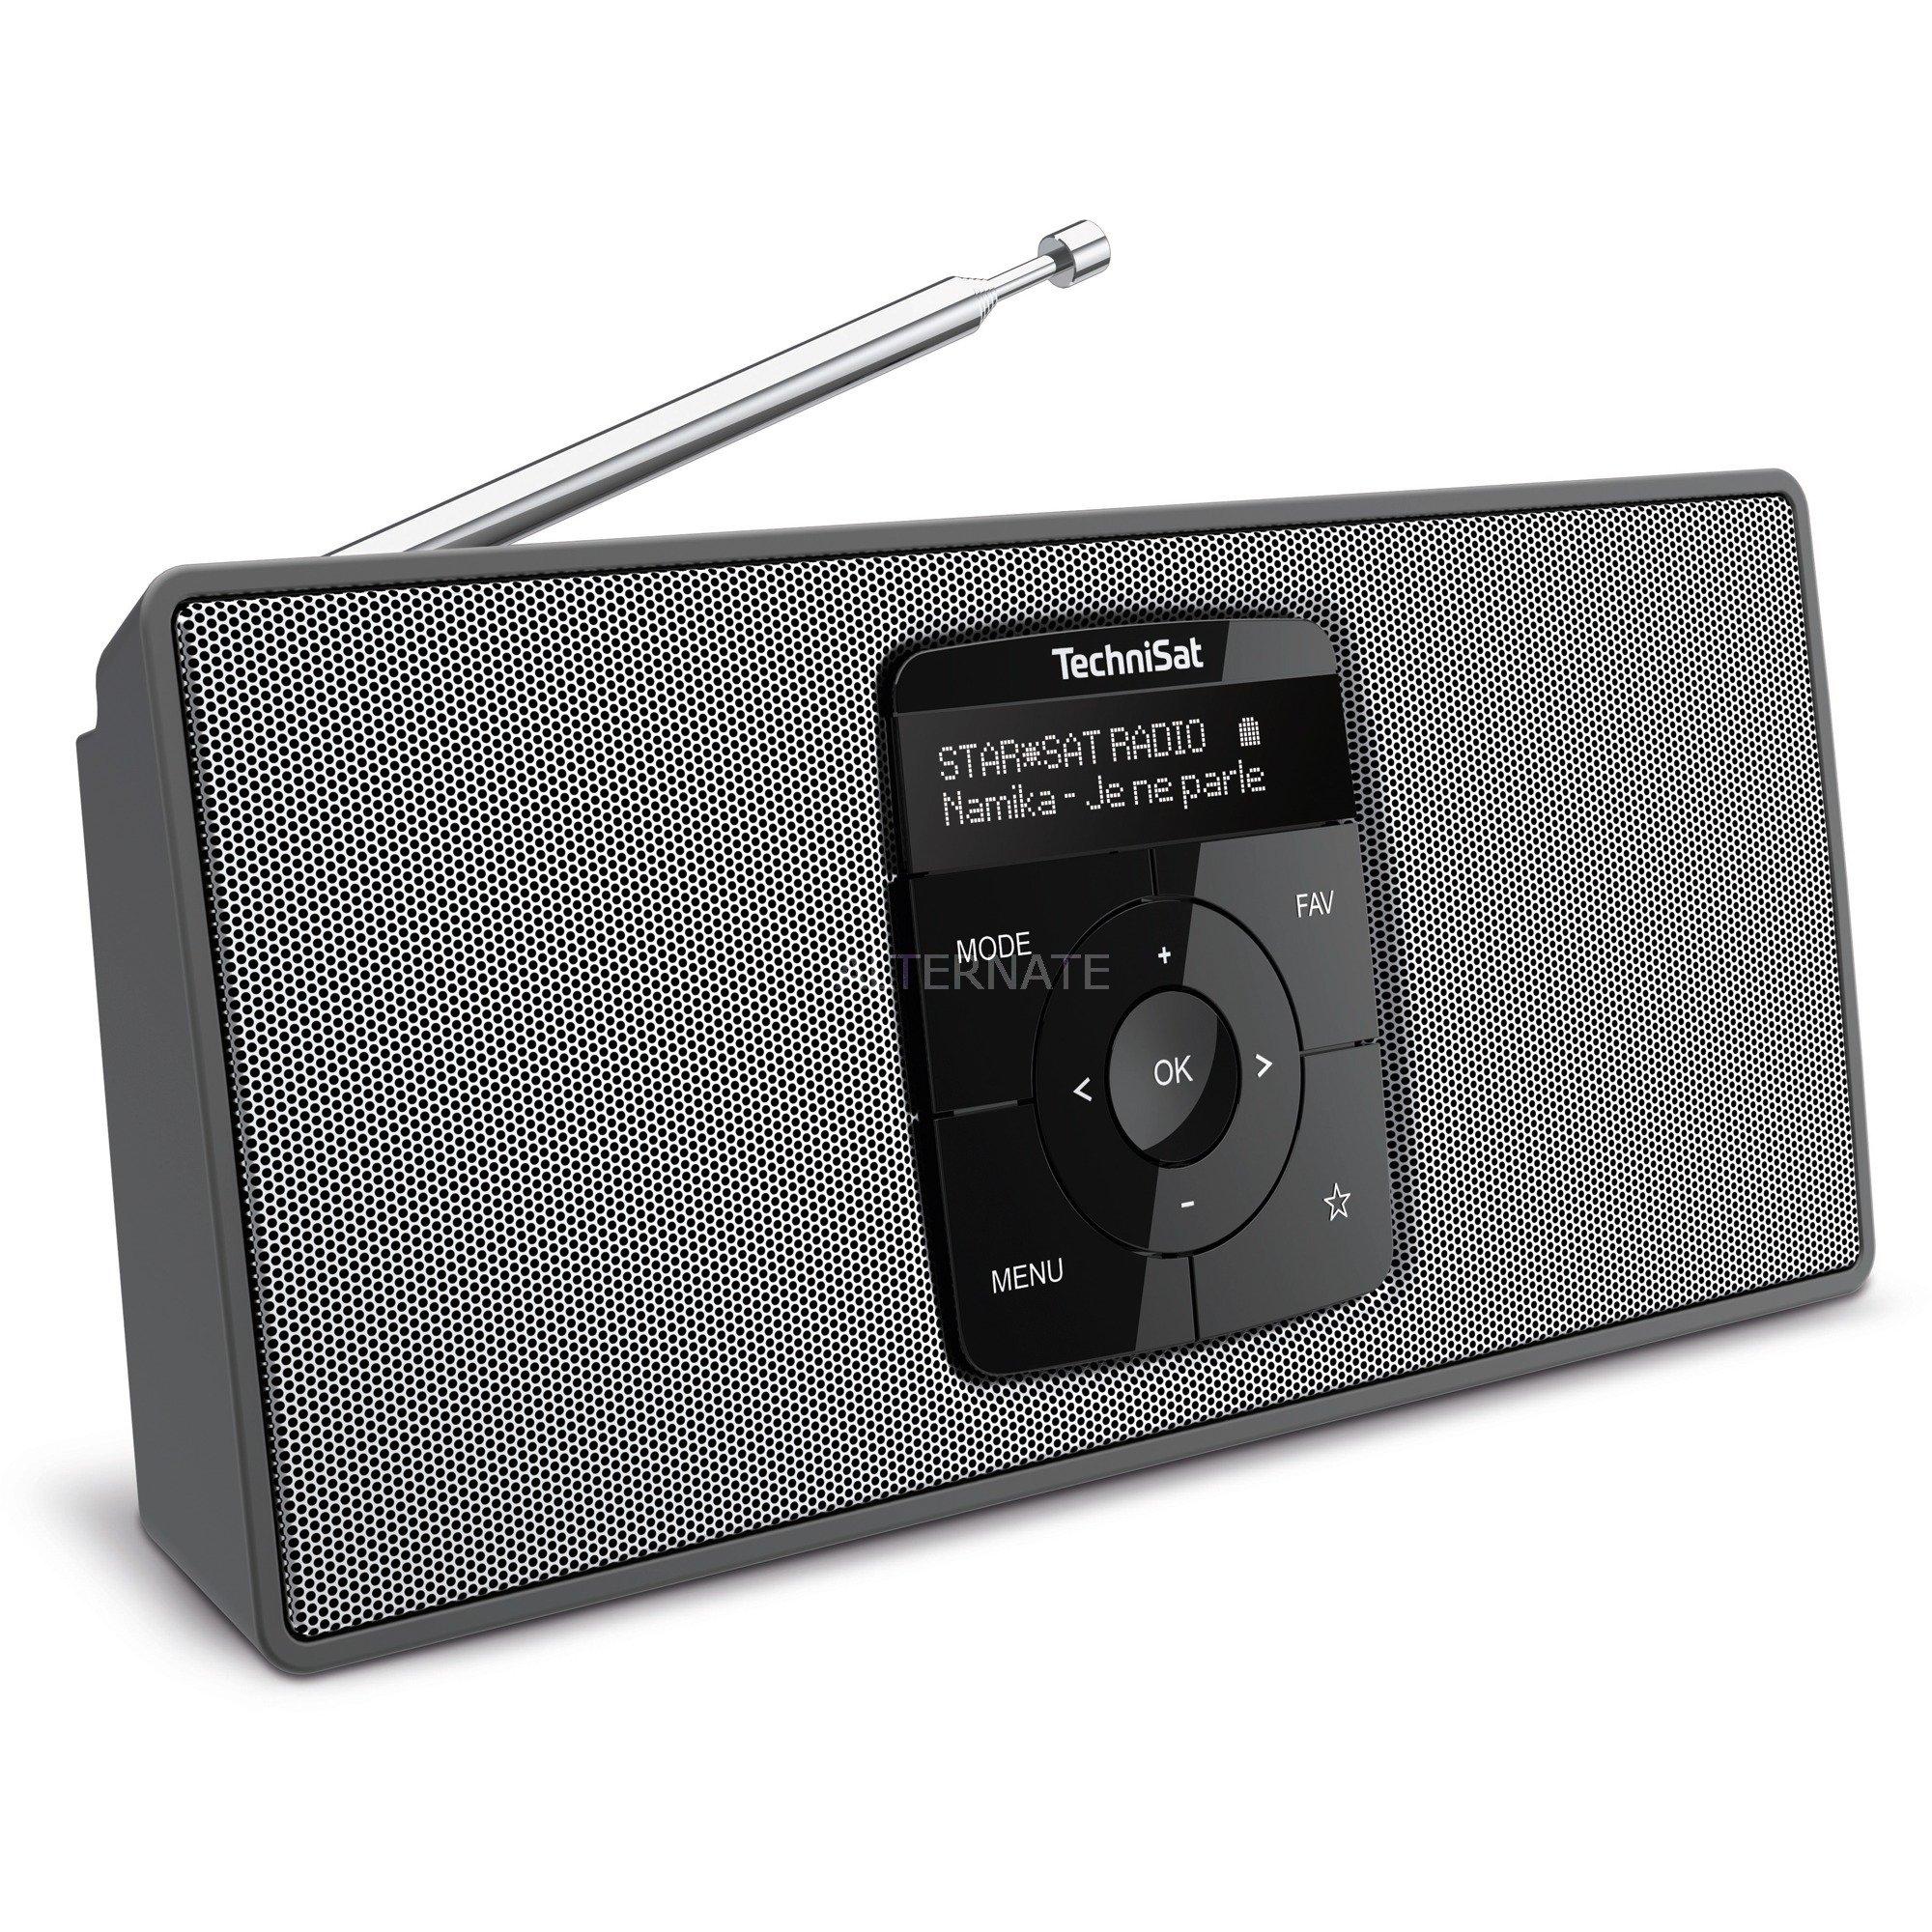 0000/3911 radio Portátil Digital Negro, Plata